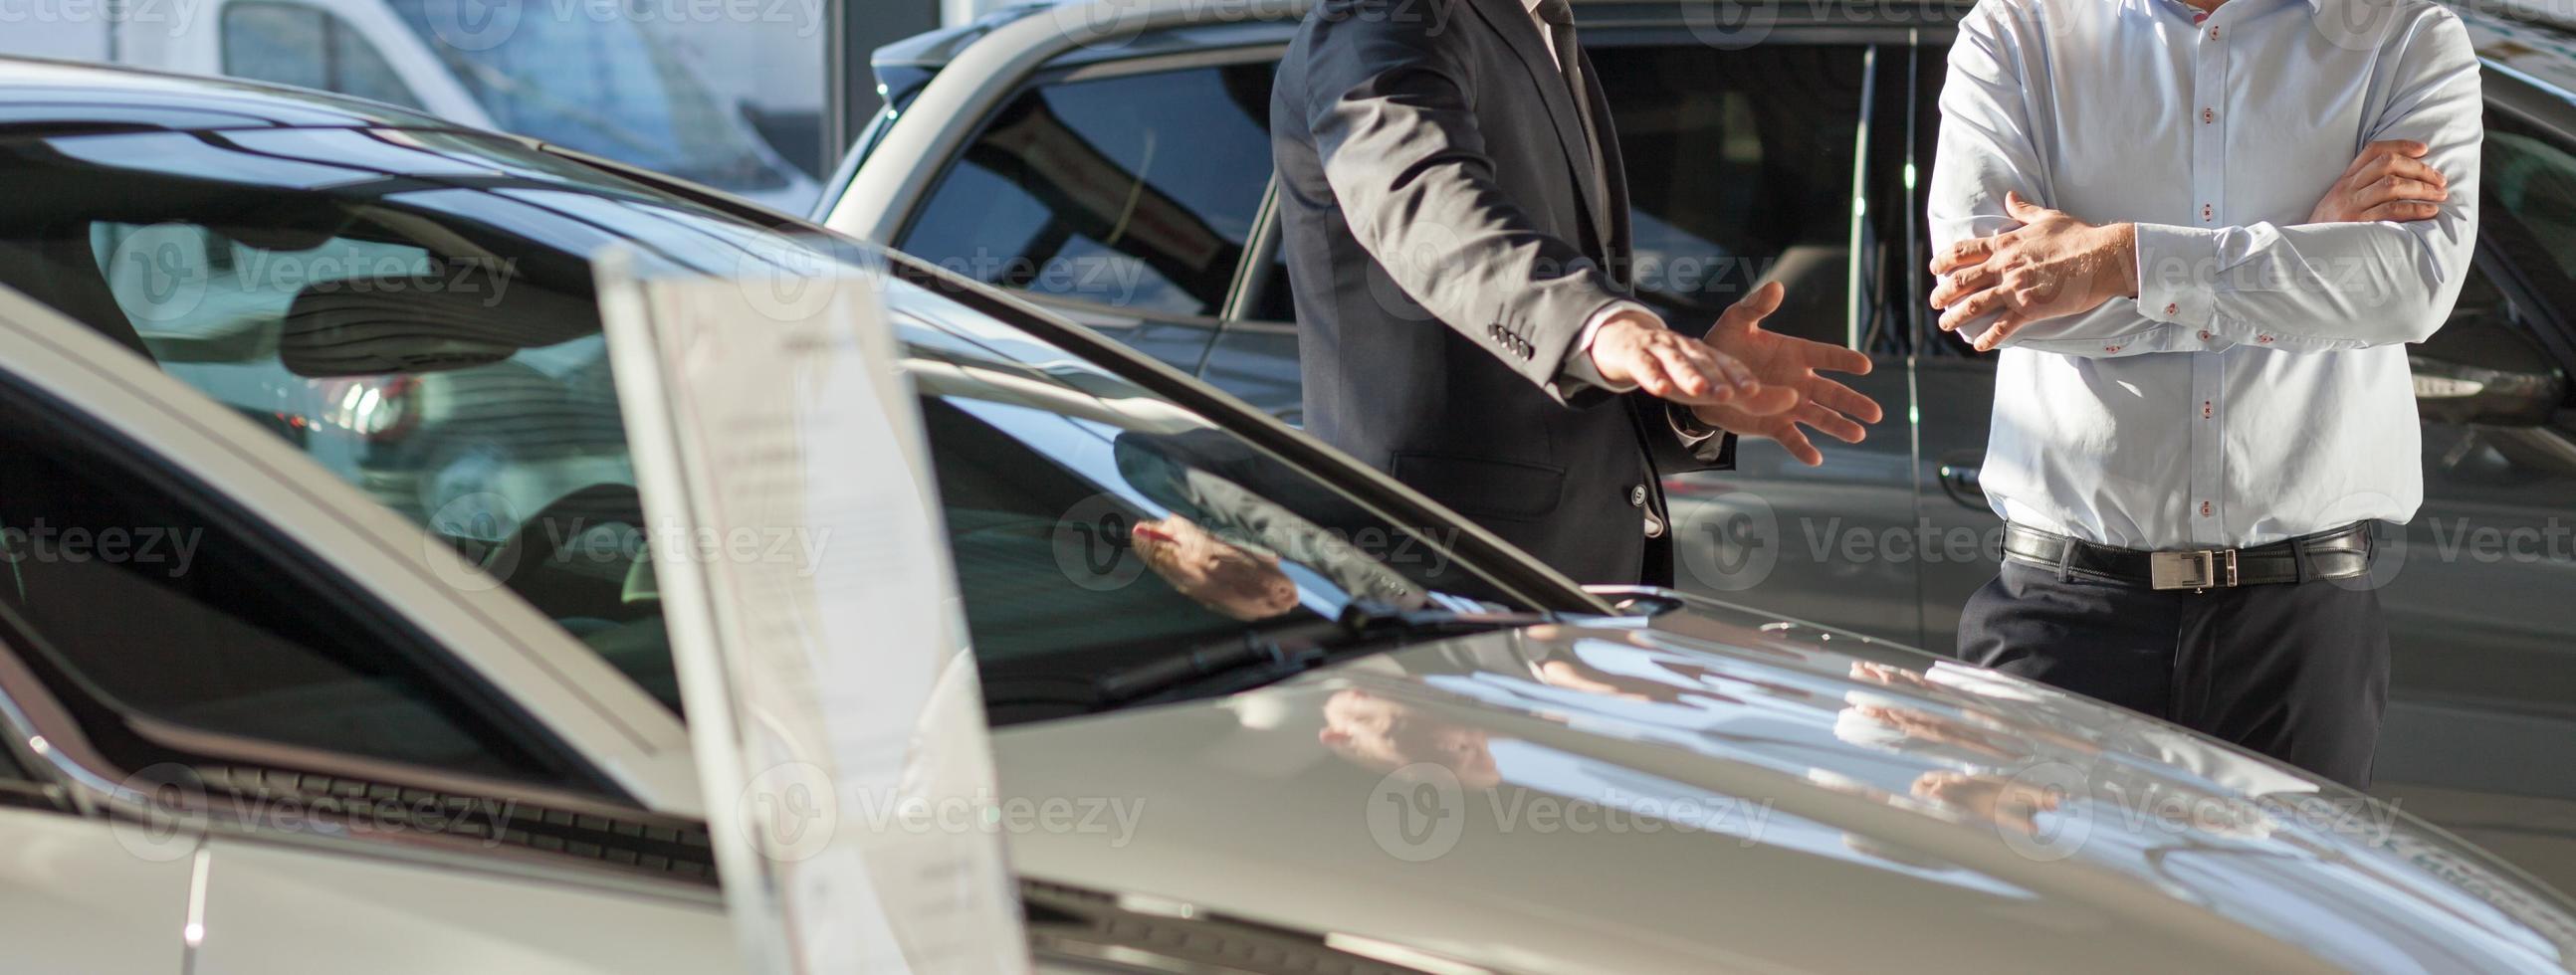 bilhandlare som presenterar ny bil foto